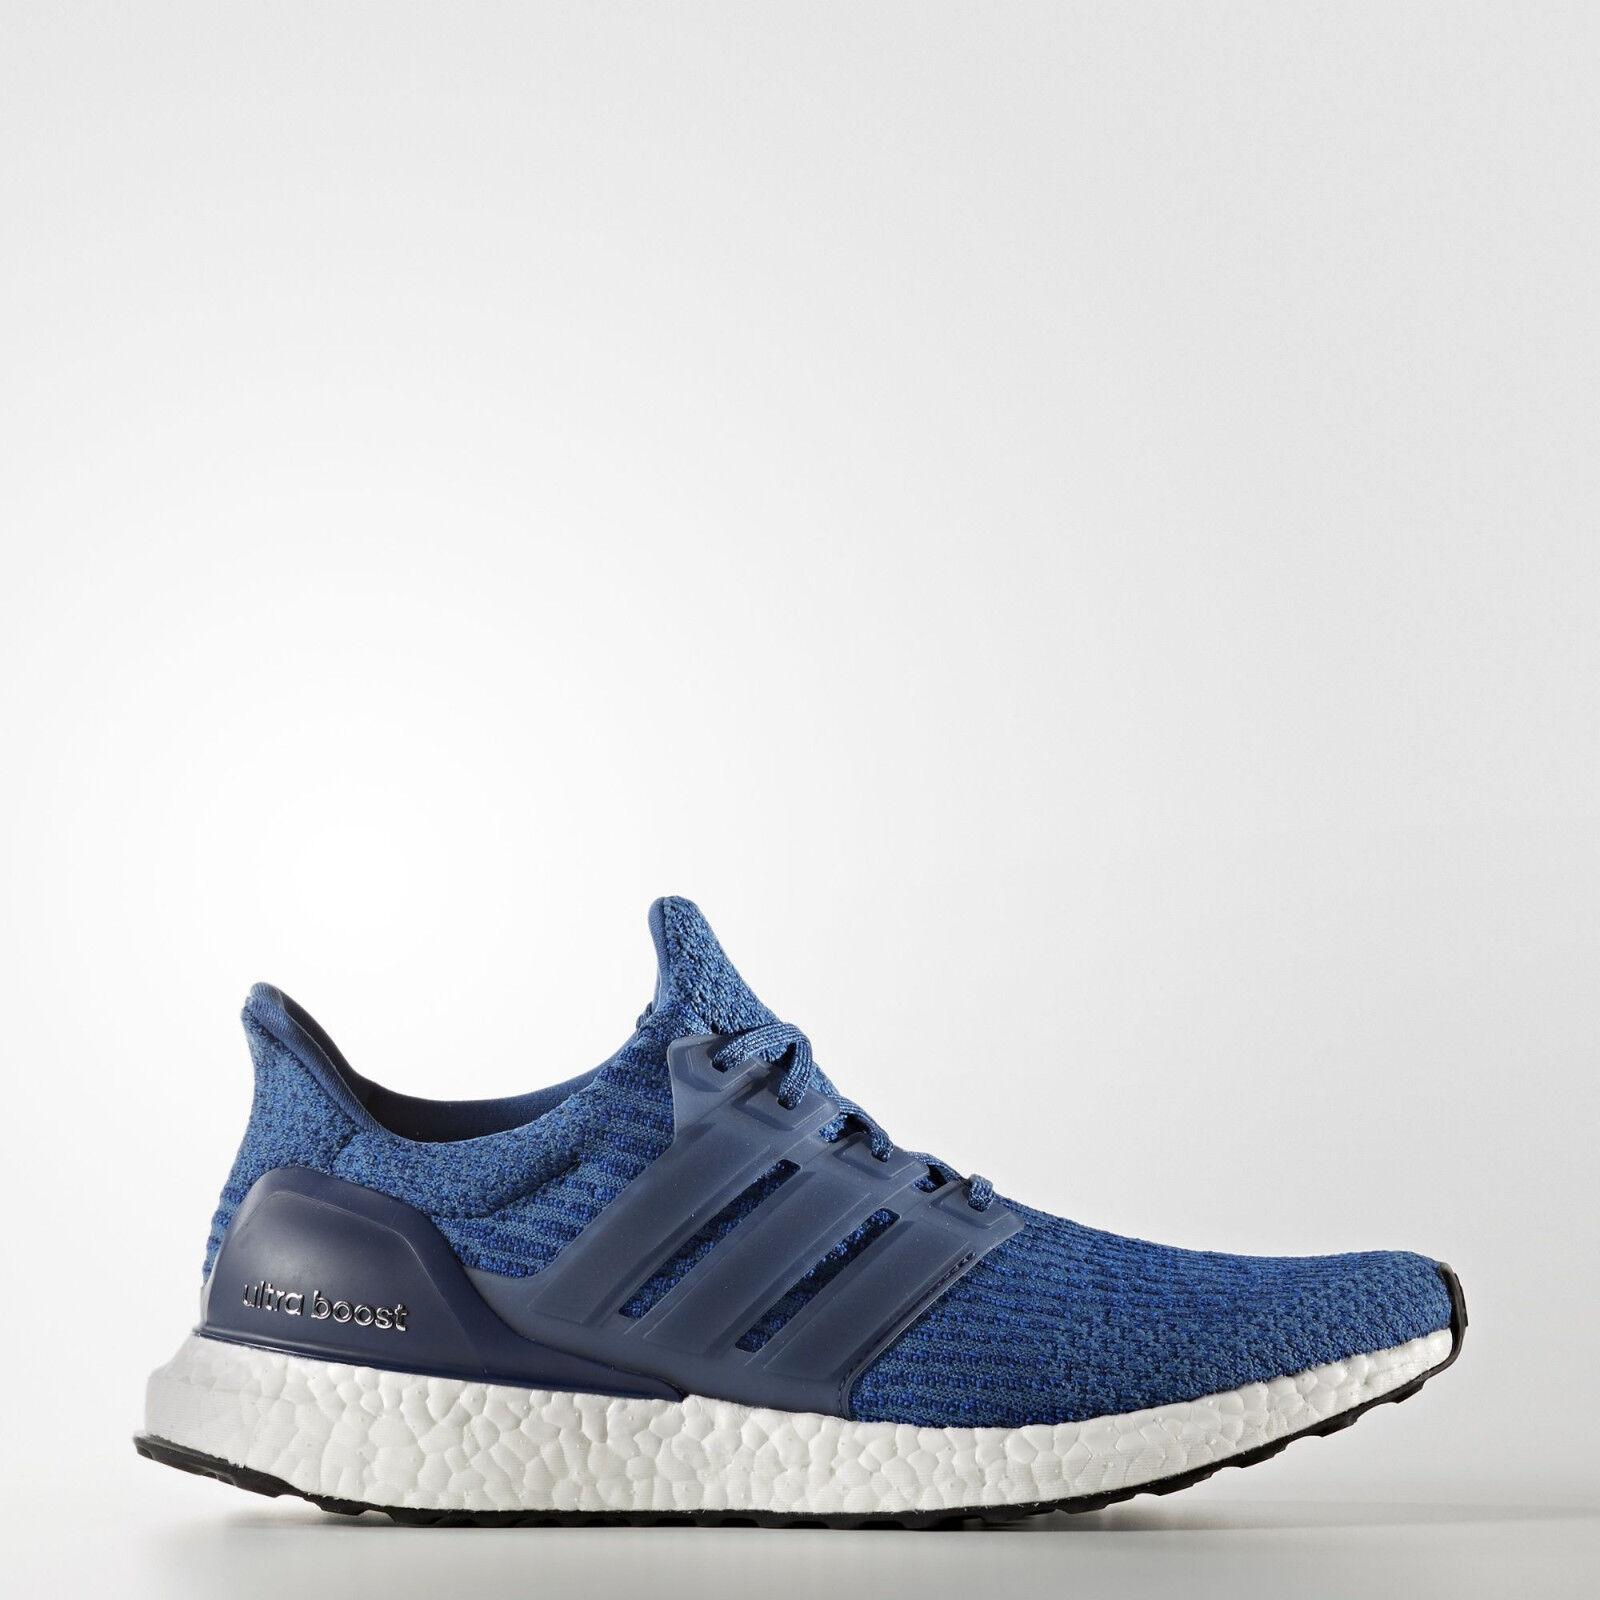 Adidas Mens Ultra Boost Mystery Blau Running schuhe BA8844 UltraBOOST